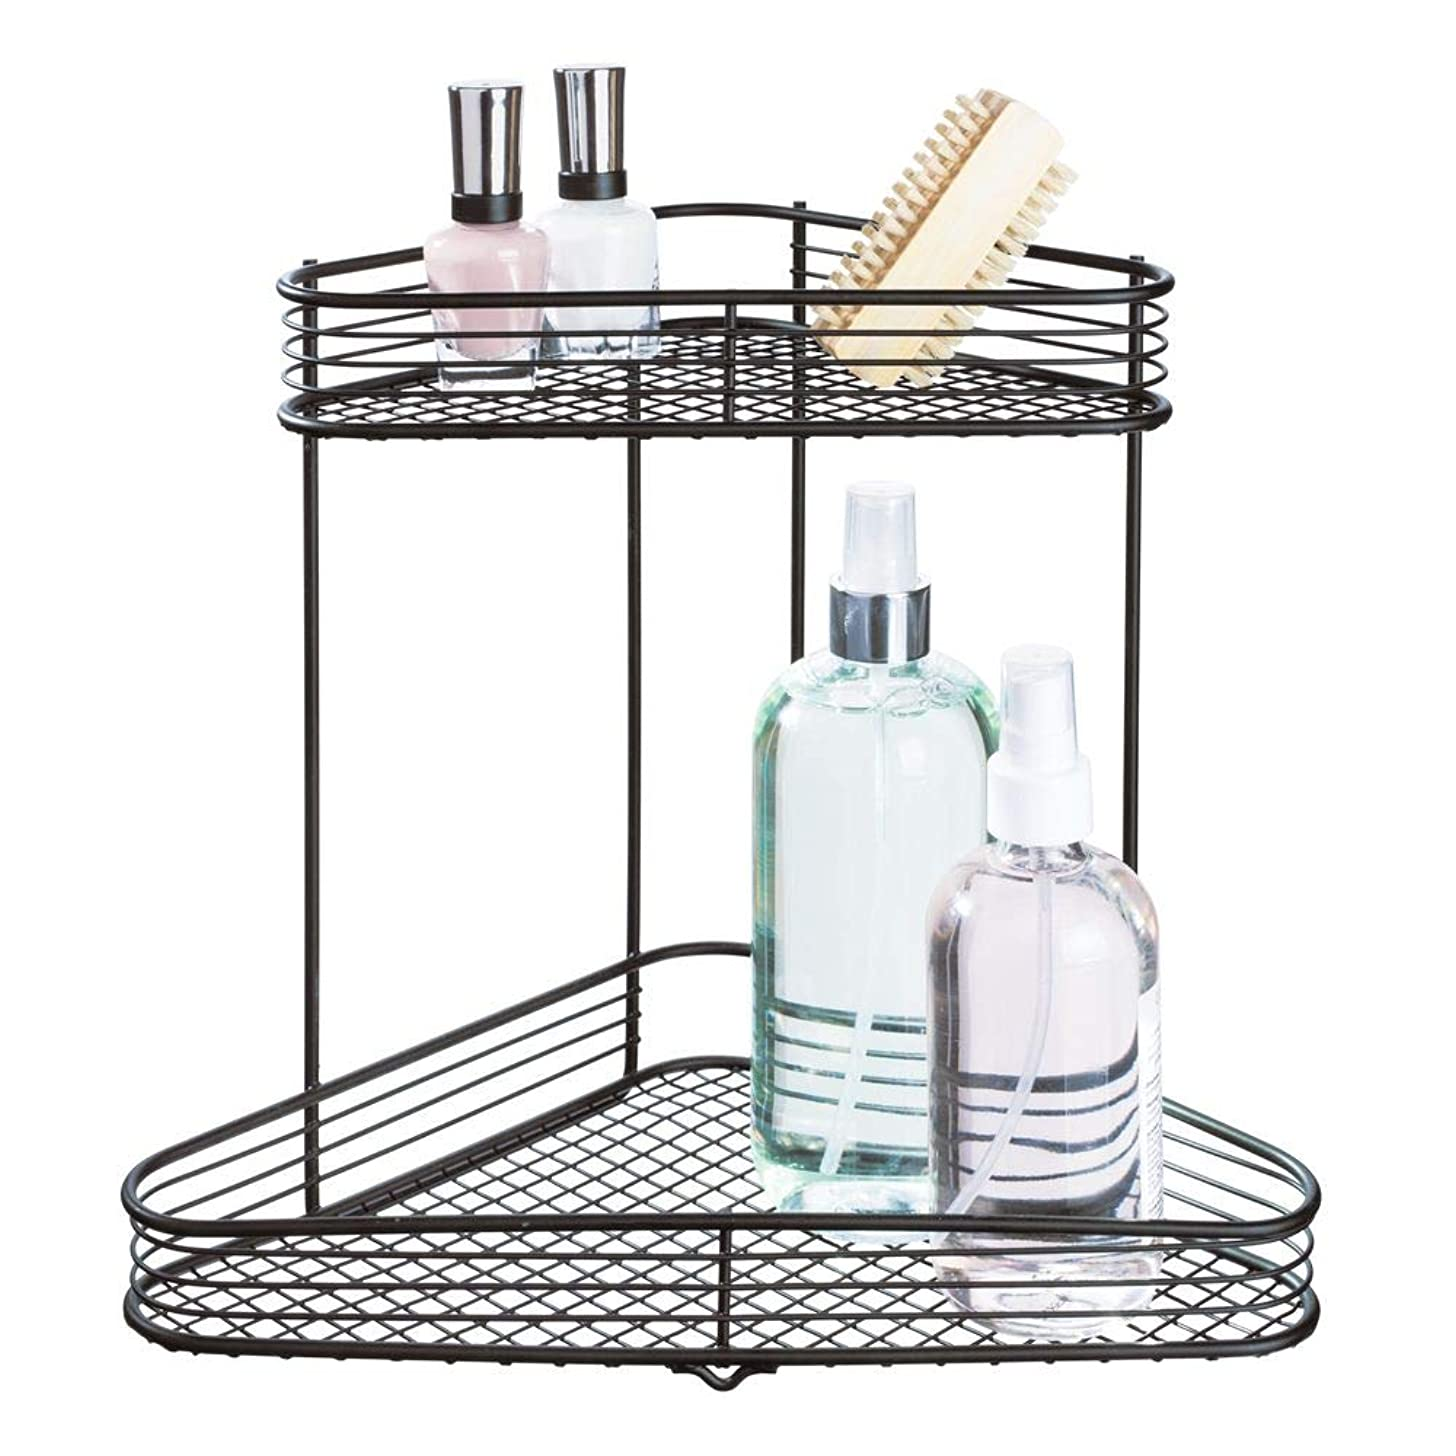 InterDesign Vienna Metal Wire Corner Standing Vanity Caddy, 2-Tier Shelf Baskets for Countertops, Desks, Dressers, Bathroom, 9